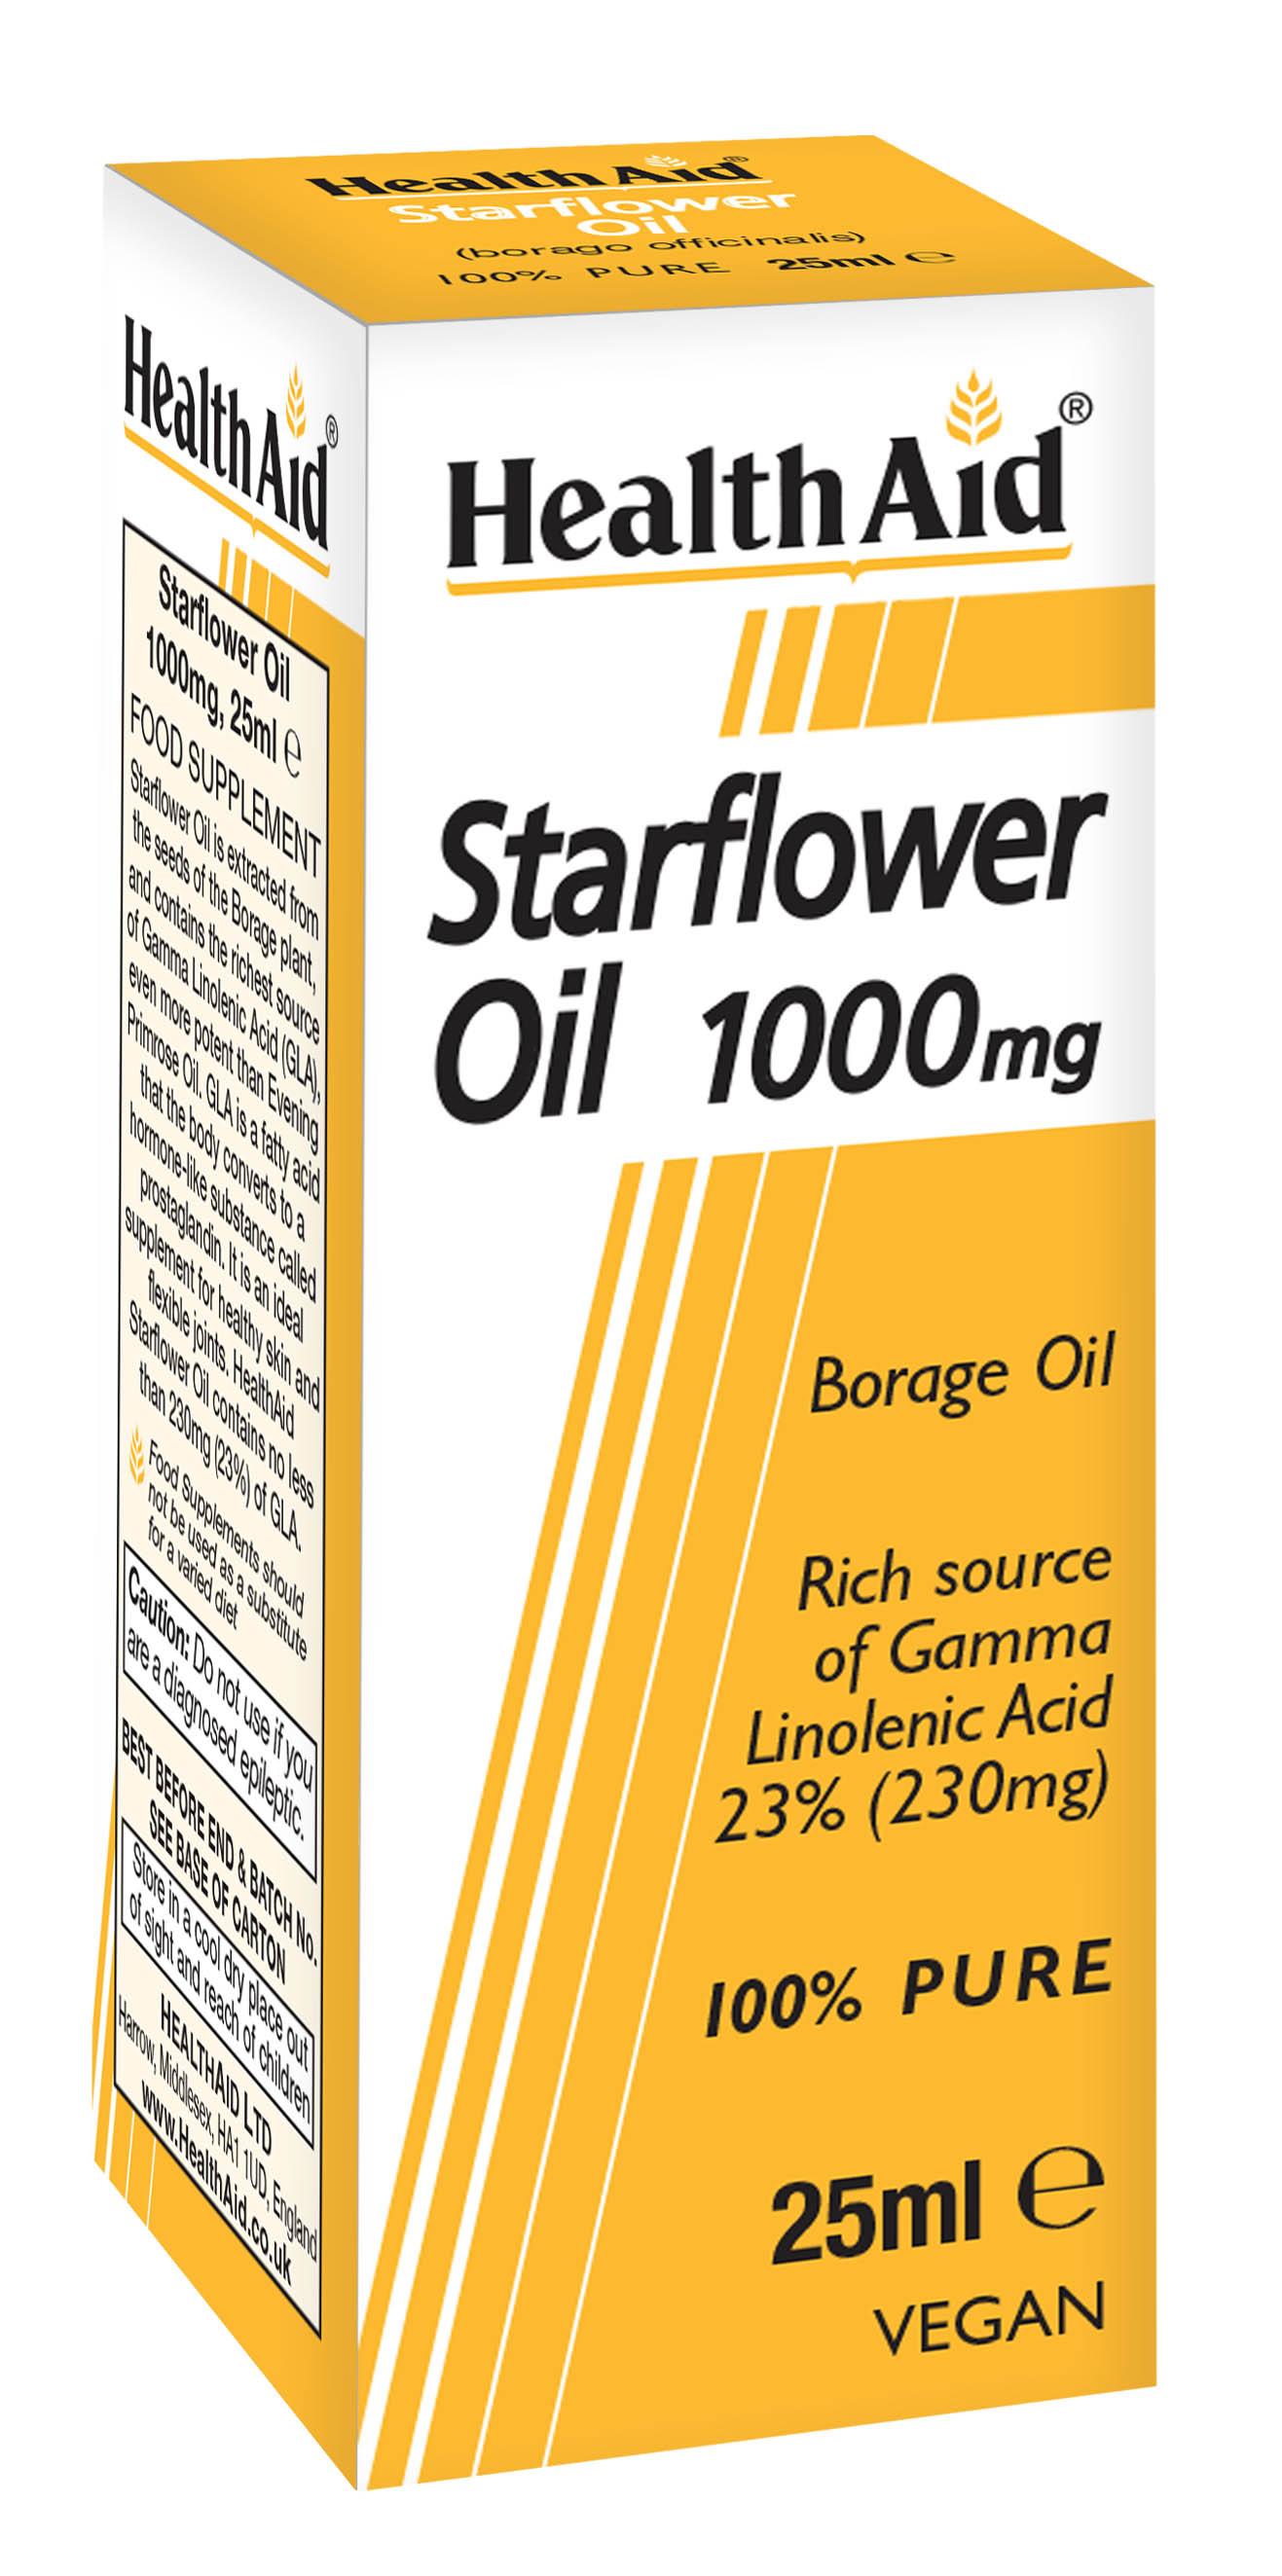 Starflower Oil 1000mg 25ml